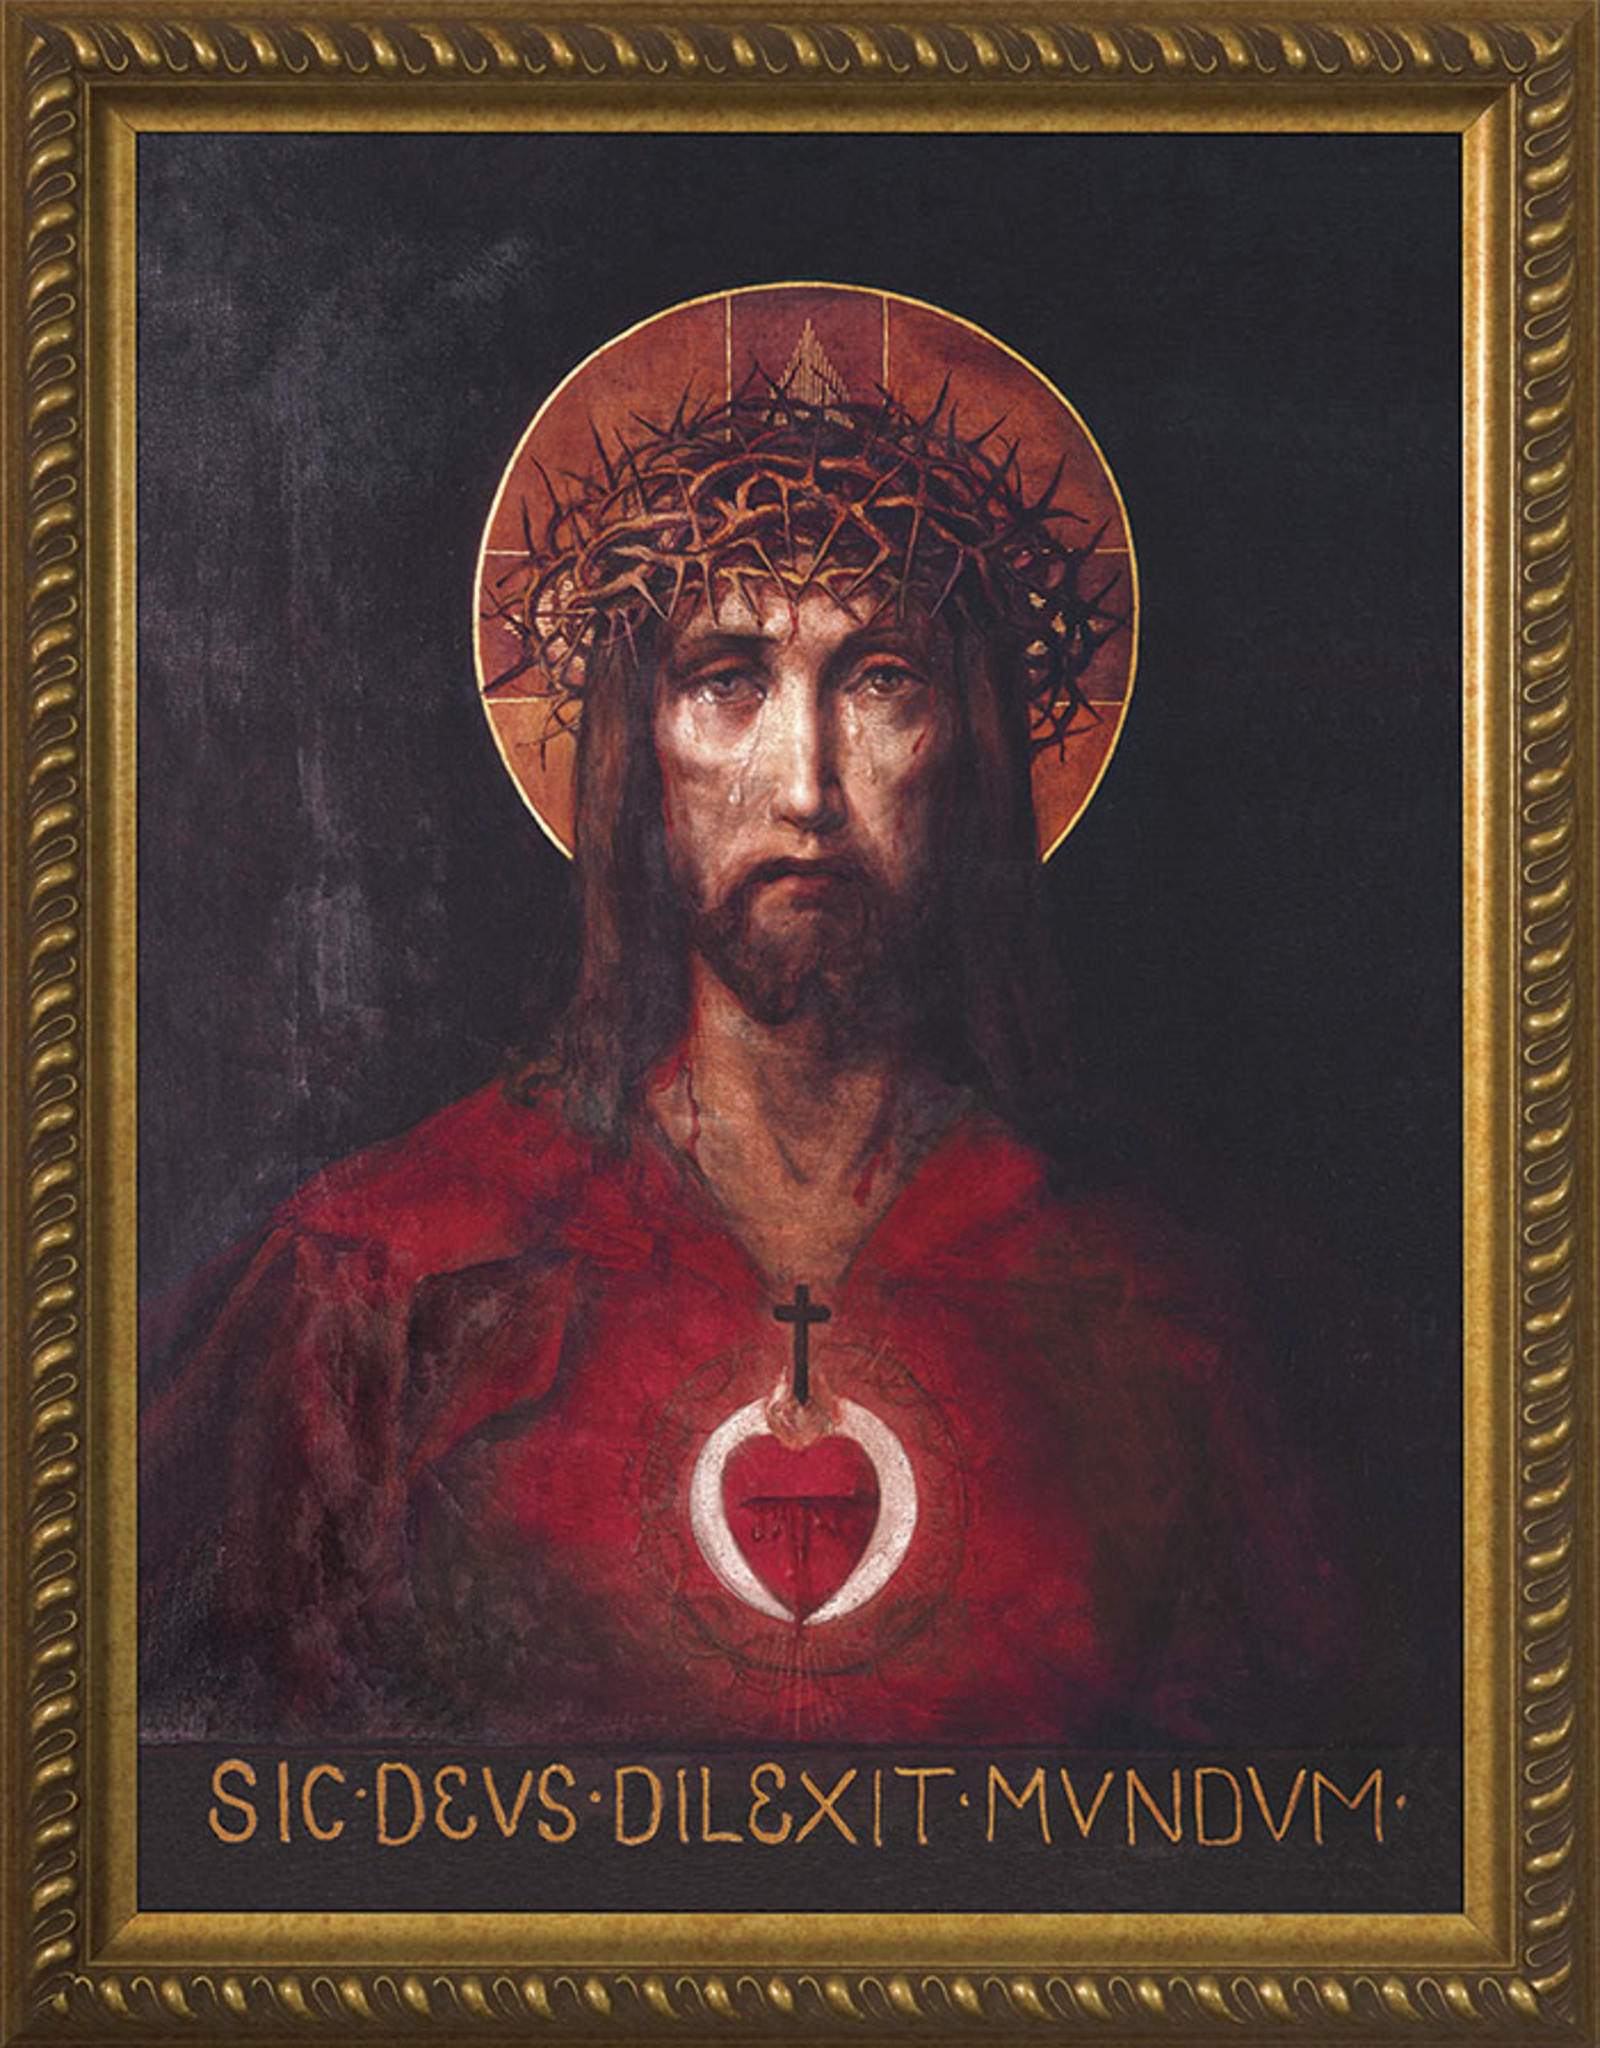 "Nelson/Catholic to the Max For God So Loved the World Framed Image 12 x 16"" Standard Gold Frame"